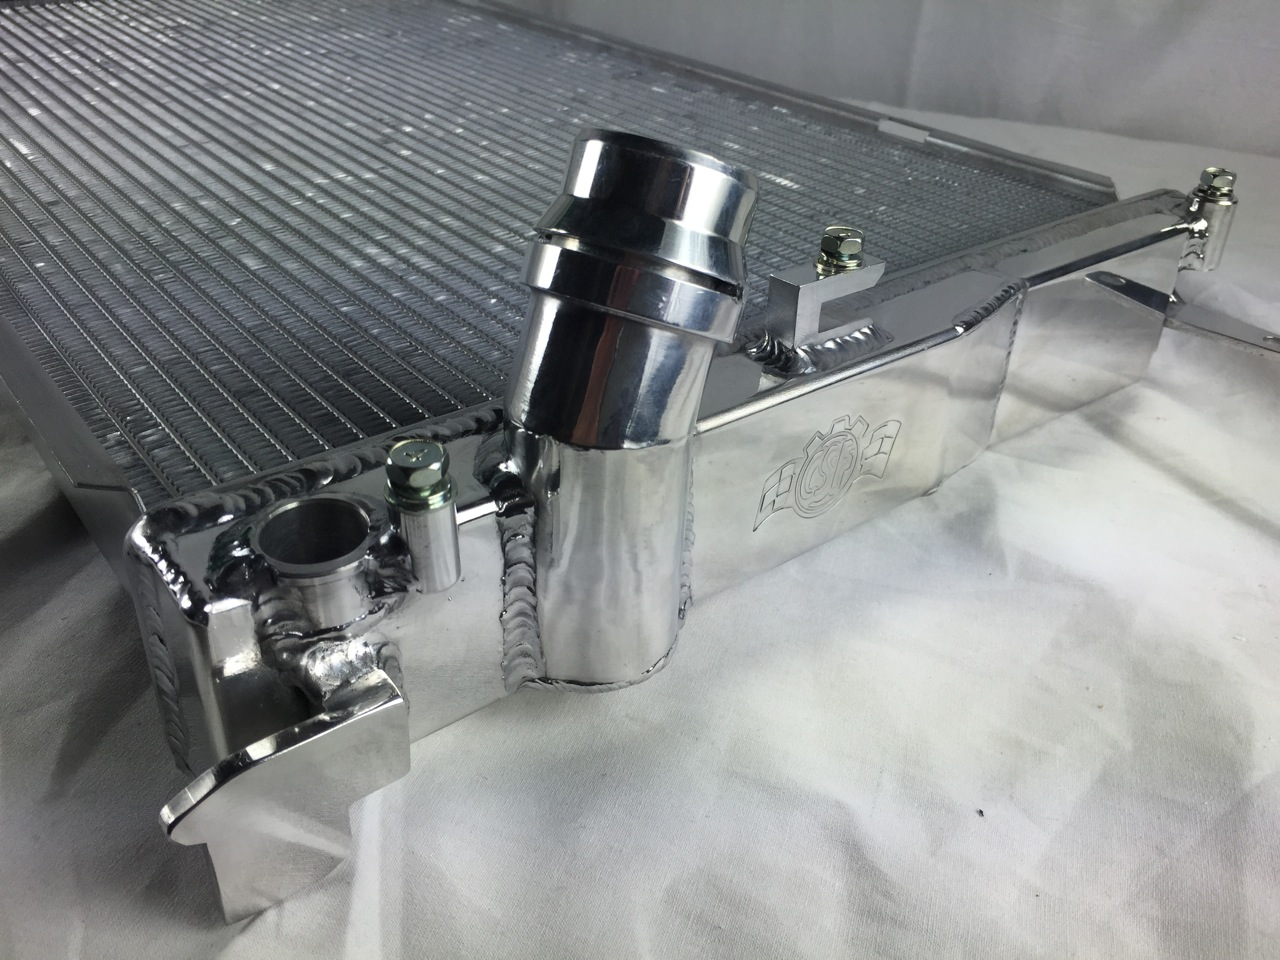 Csf Aluminium Radiator 1m E8x 135i E9x 335i E89 Z4 35i